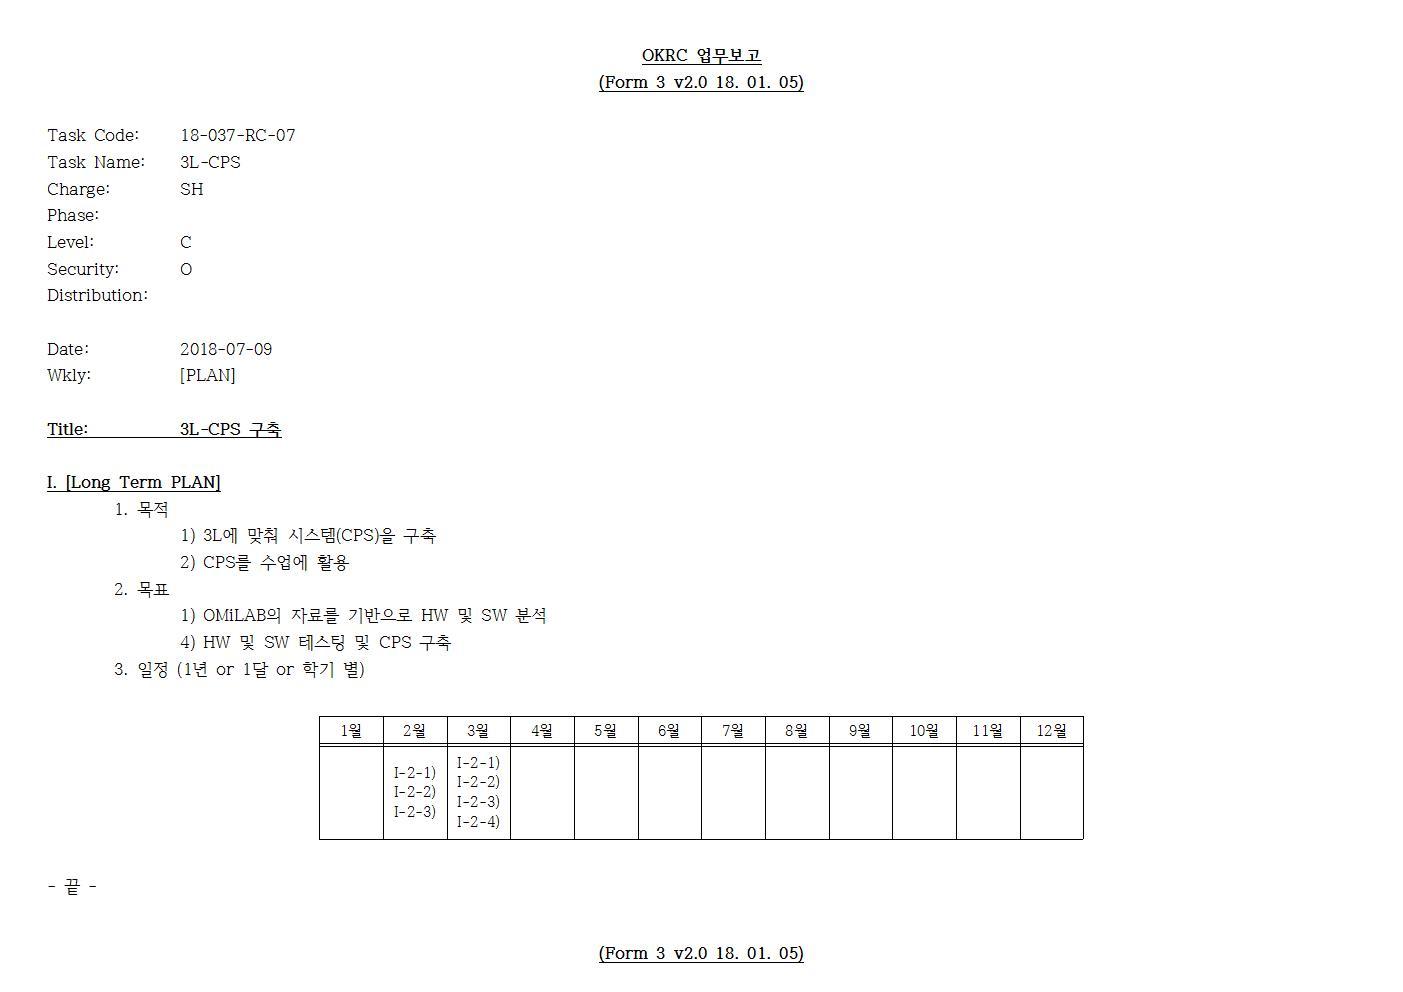 D-[18-037-RC-07]-[3L-CPS]-[2018-07-09][SH]001.jpg